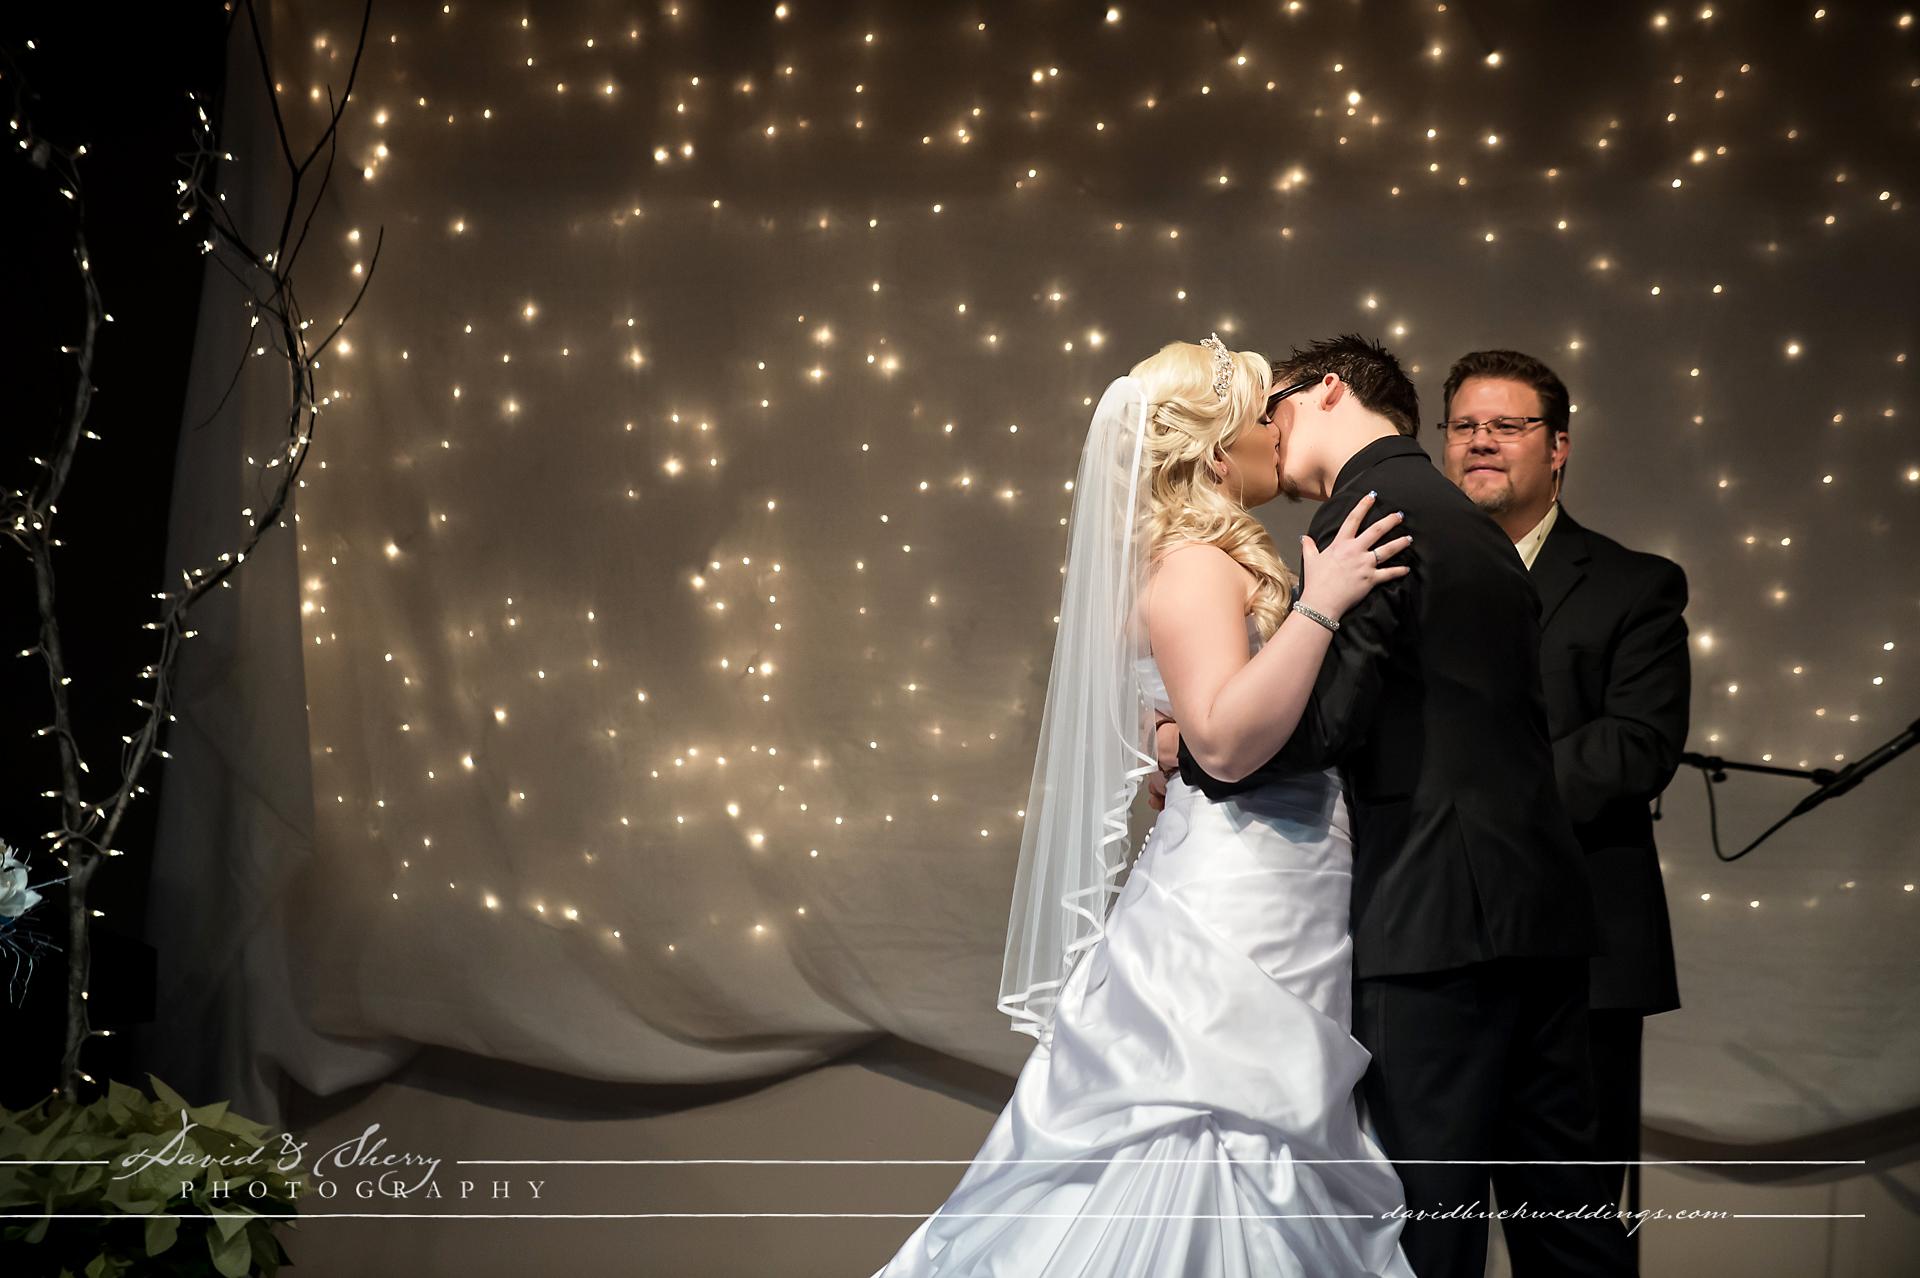 Abbotsford_Wedding_Photography_Secret_Garden_14